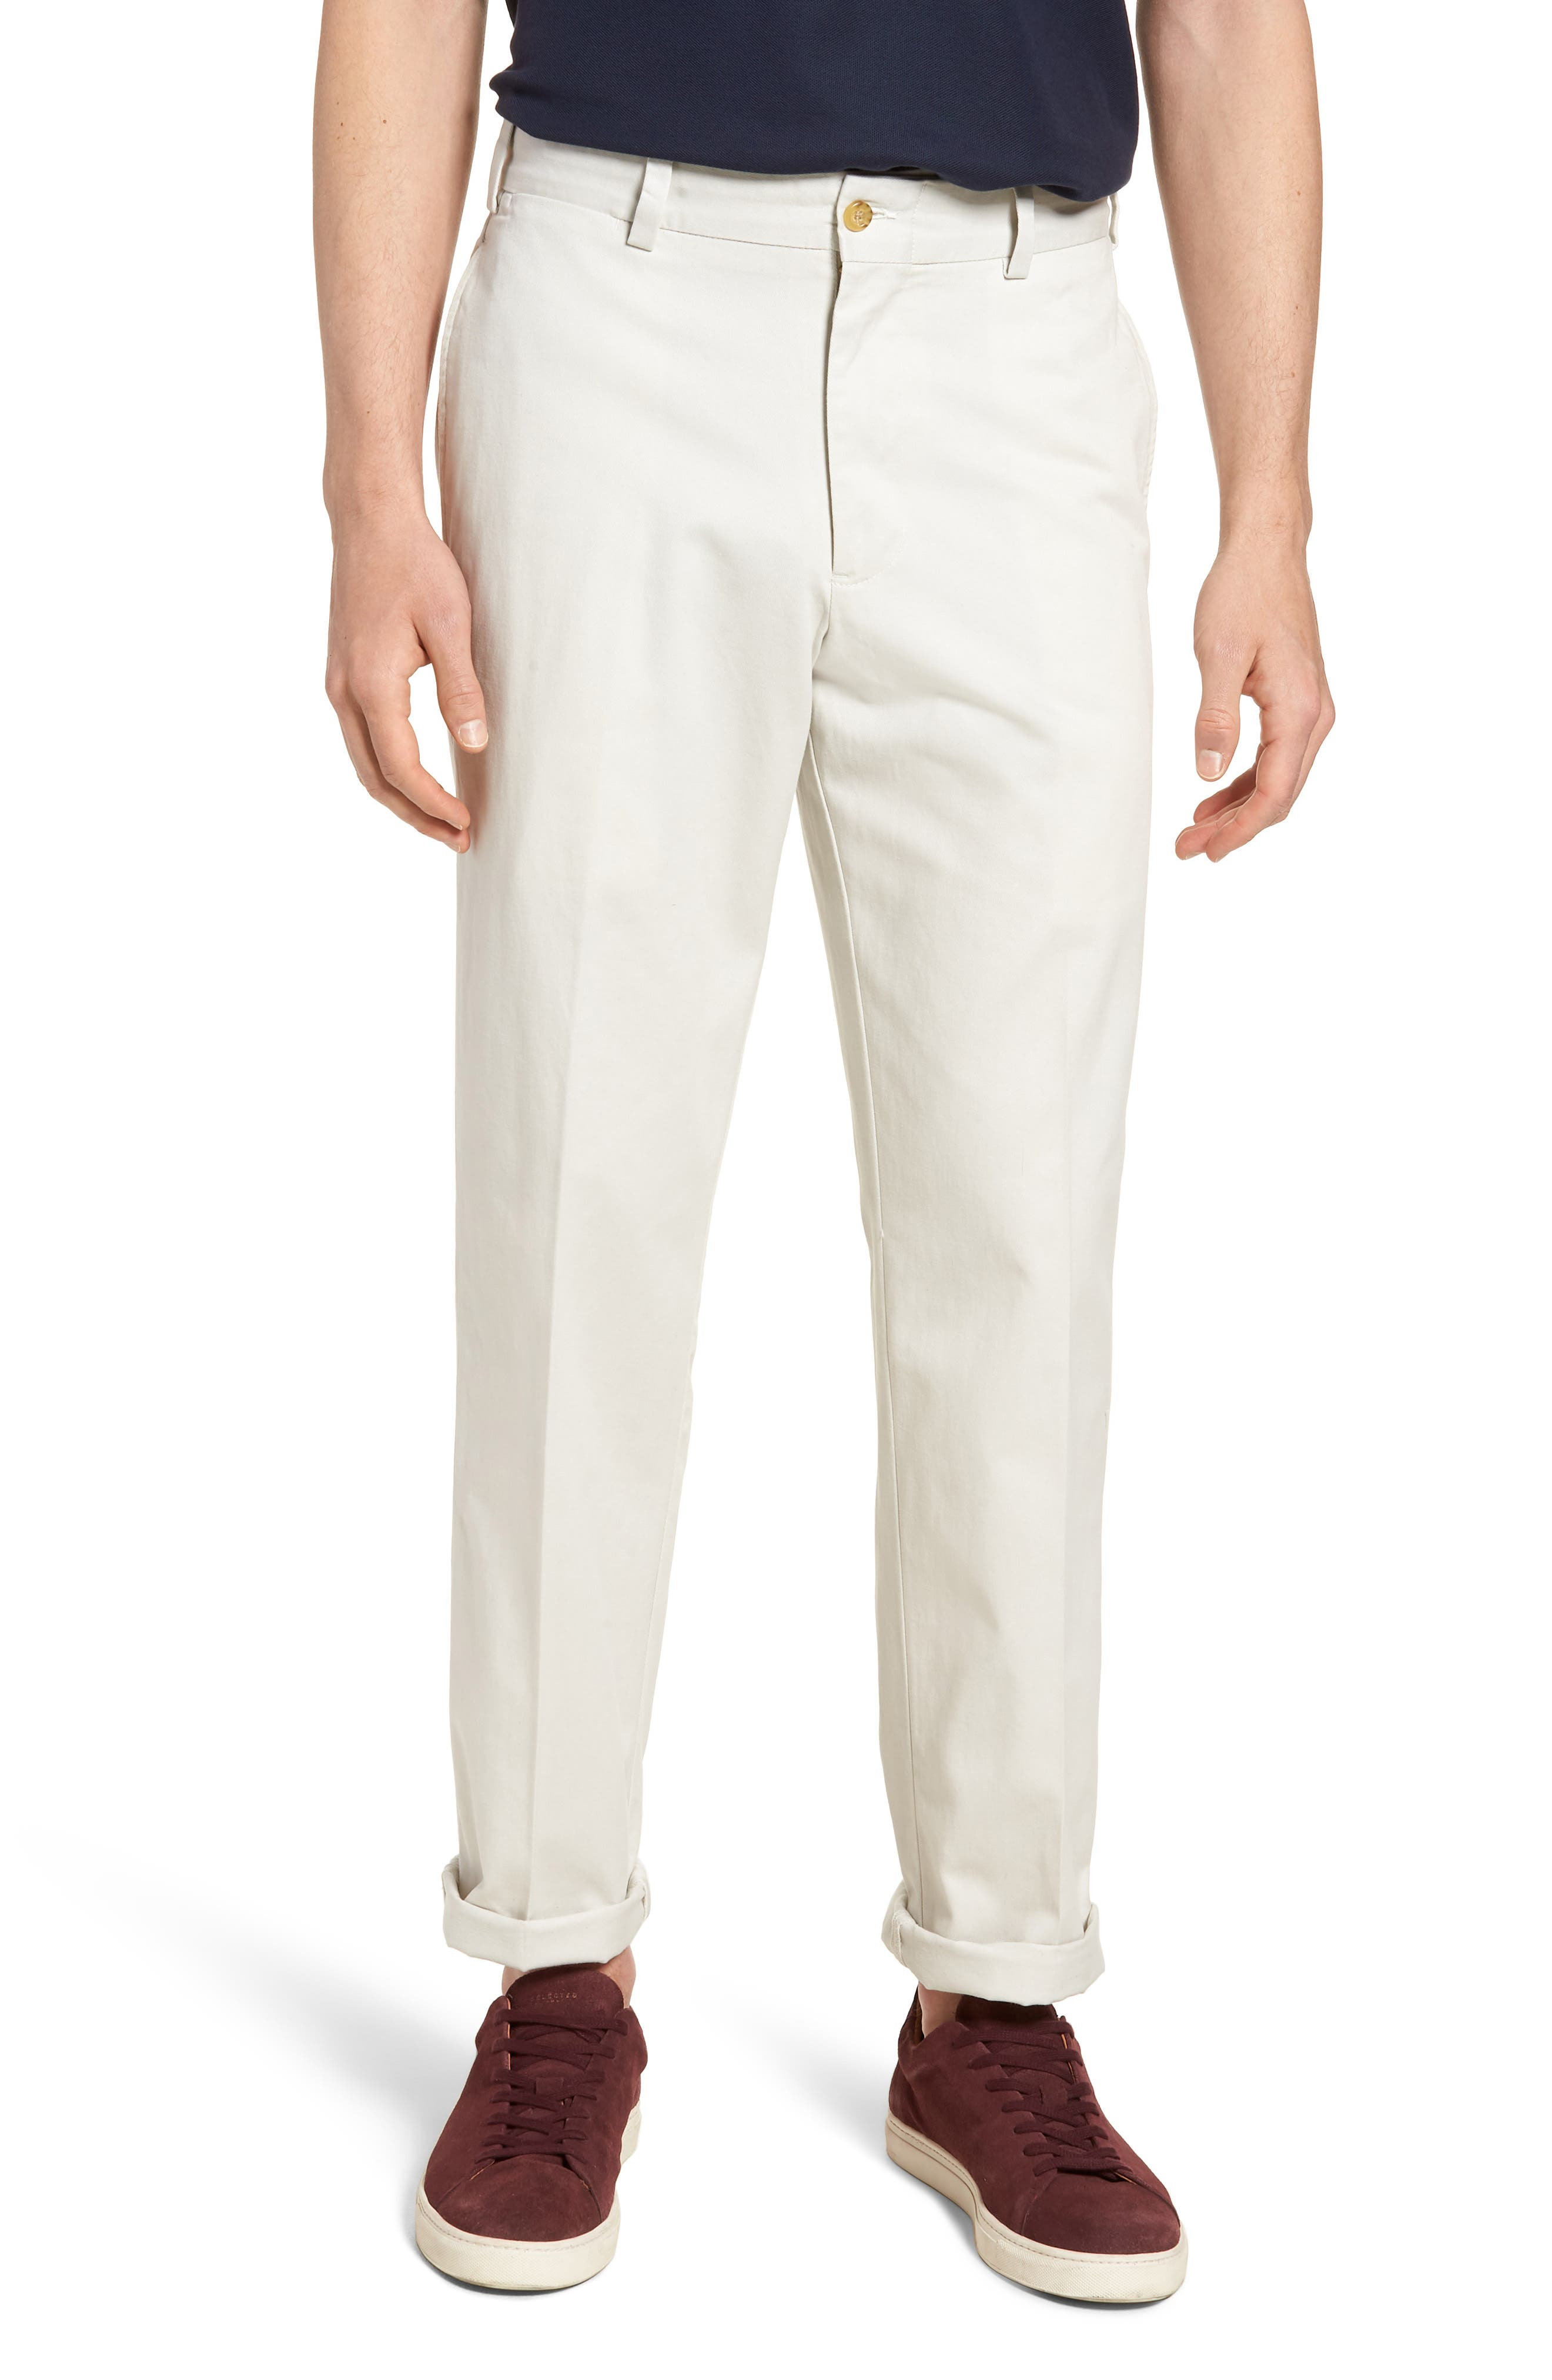 M2 Classic Fit Vintage Twill Flat Front Pants,                         Main,                         color, 270